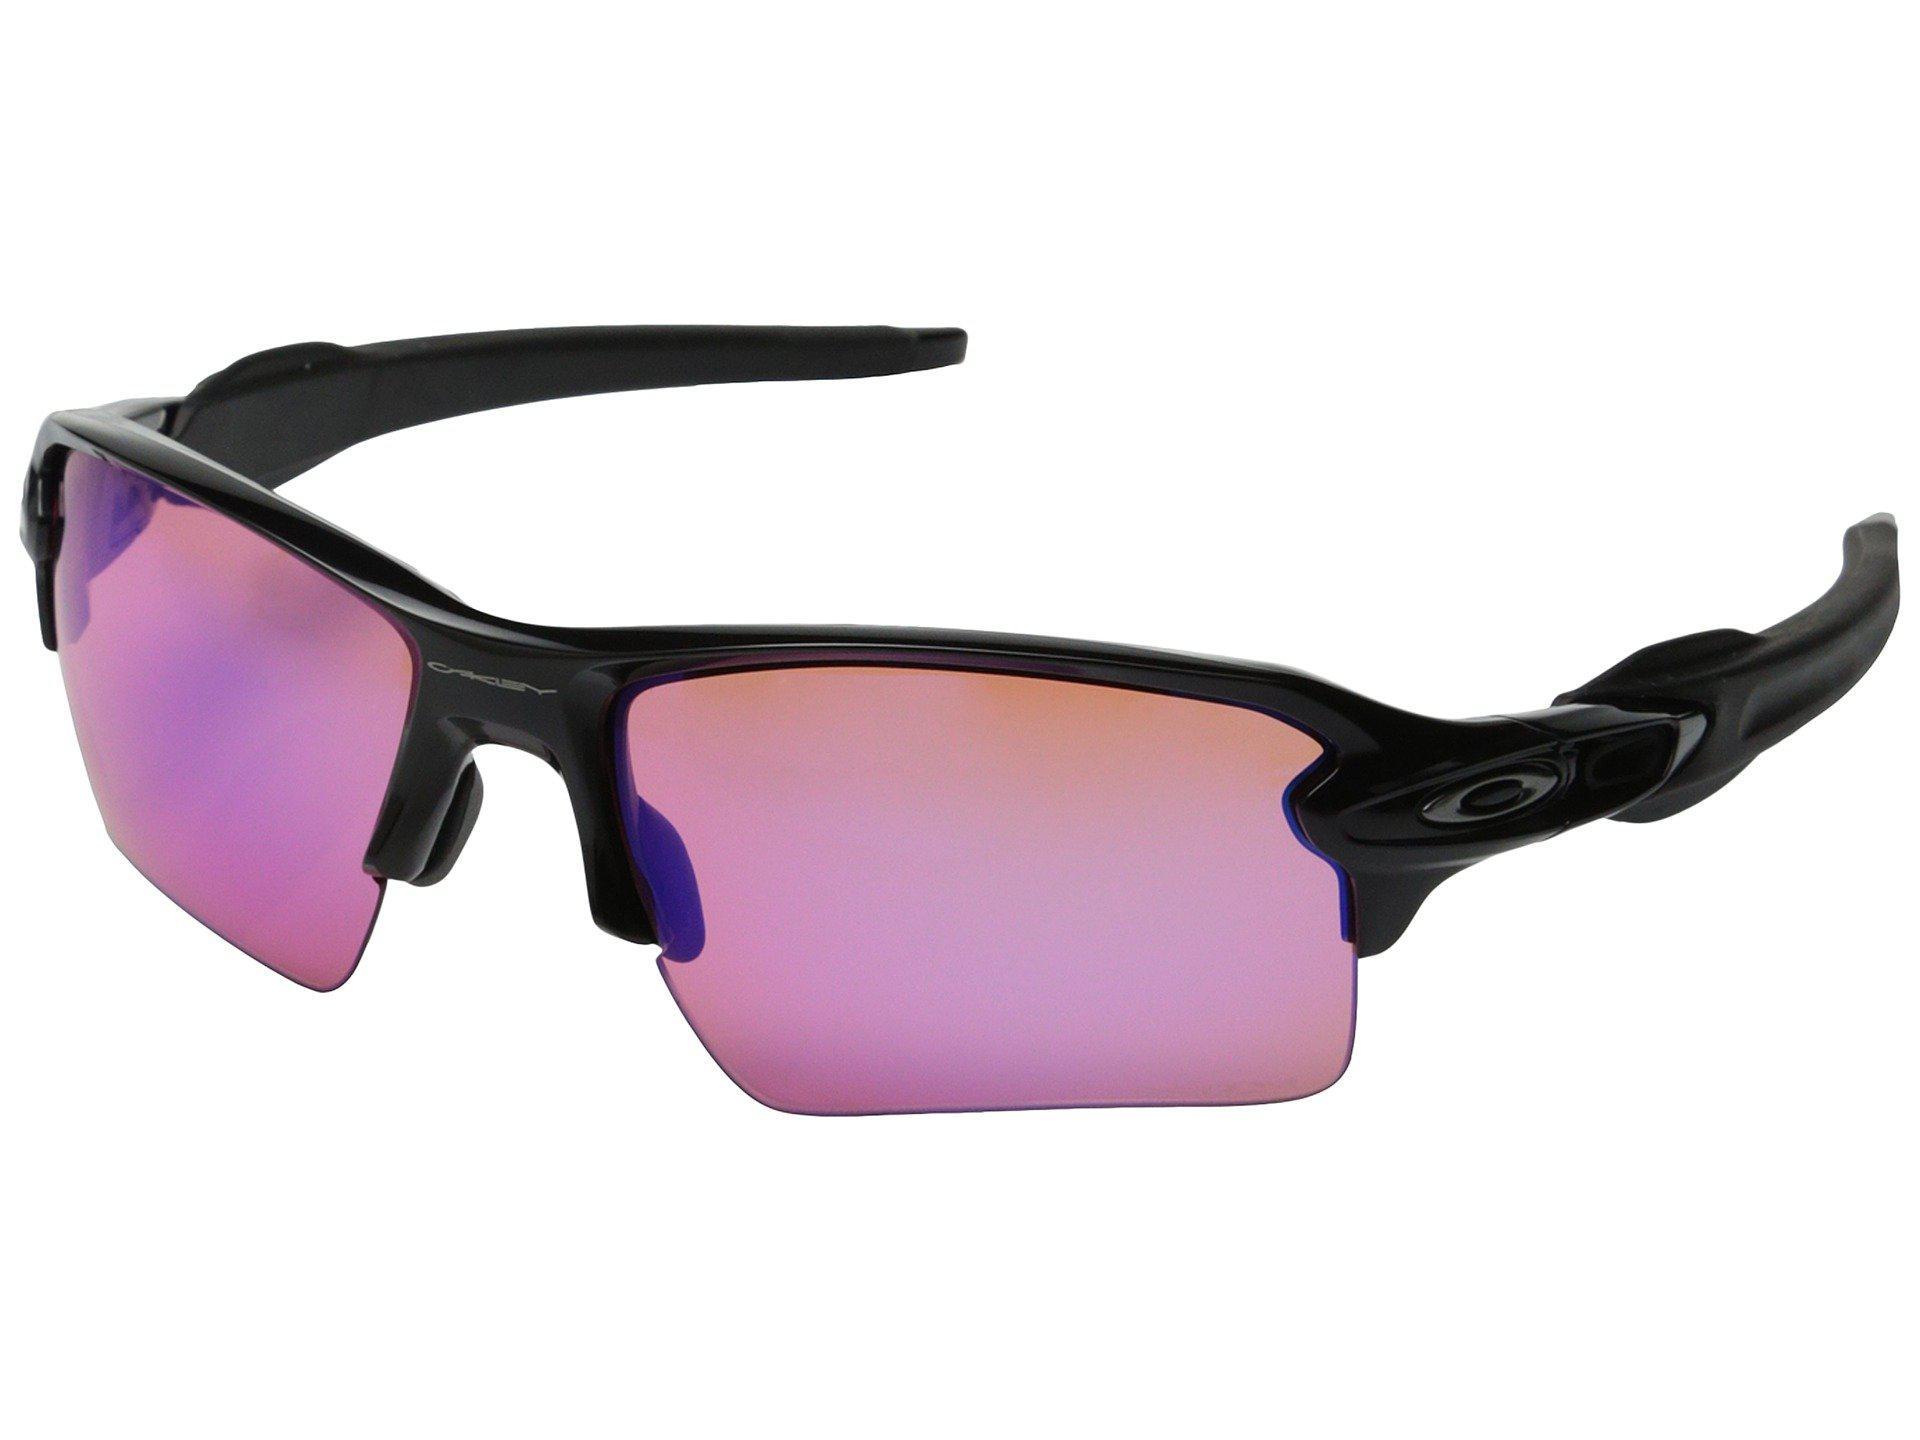 6008a3c776d1f9 Lyst - Oakley Flak 2.0 Xl (polished Black W prizm Trail) Sport ...